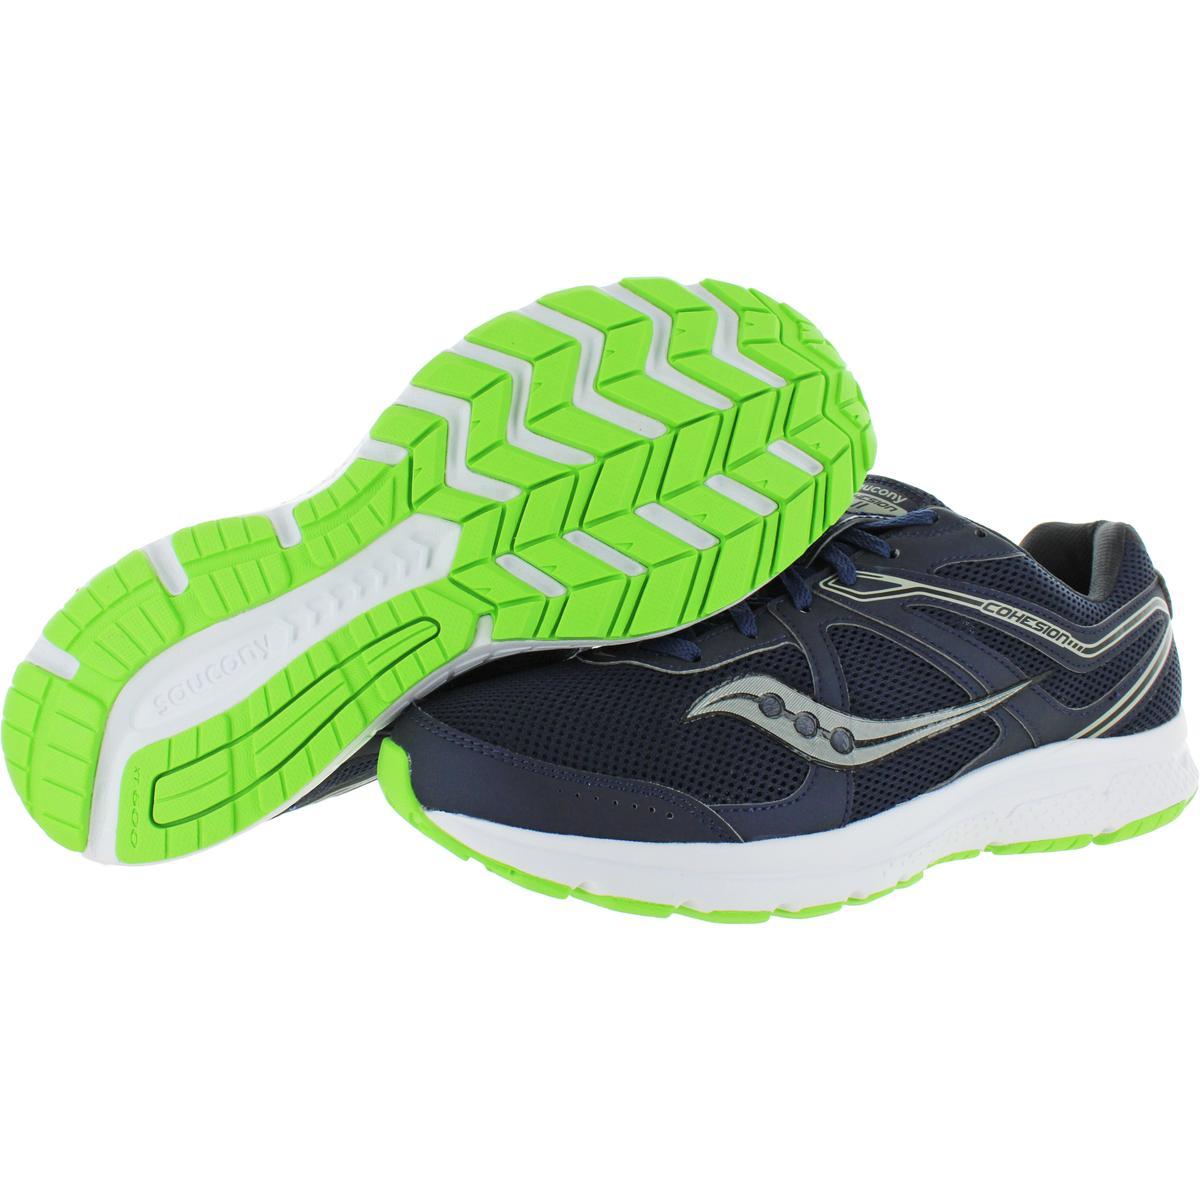 Saucony-Herren-Grid-Kohaesions-11-Ubung-Fitness-Laufschuhe-Sneakers-bhfo-2076 Indexbild 9